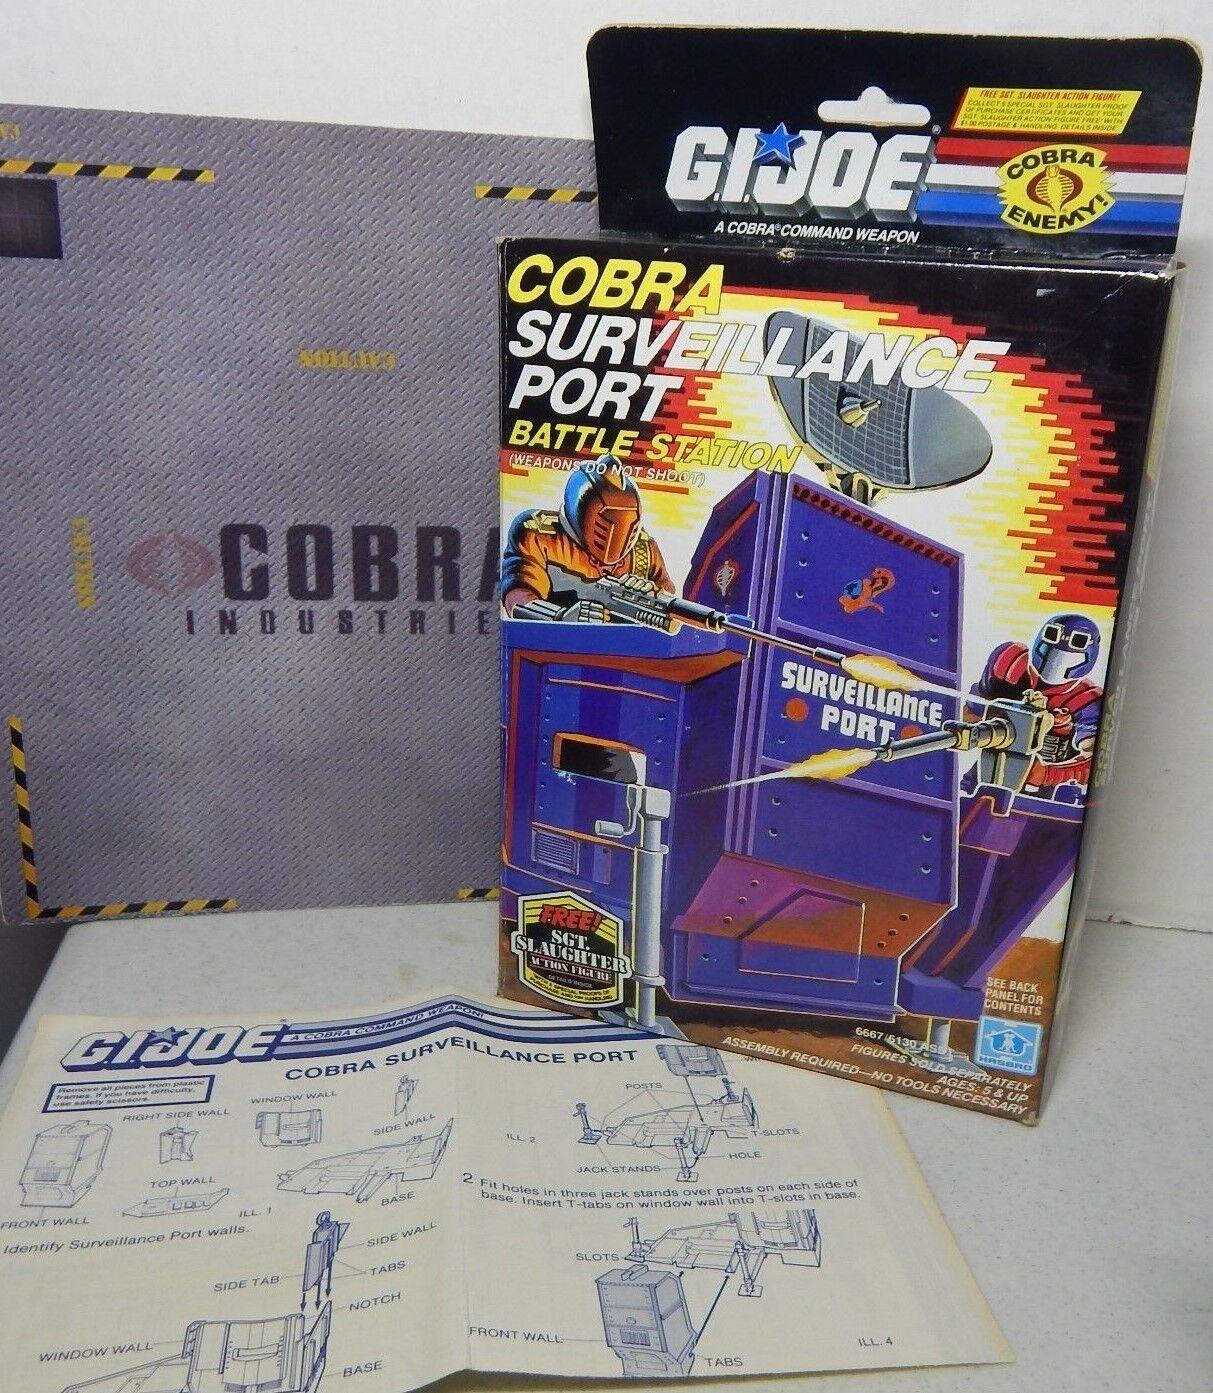 Gi - joe - 1986 cobra überwachung port & box - 100% mit blaupausen  ungebrochen